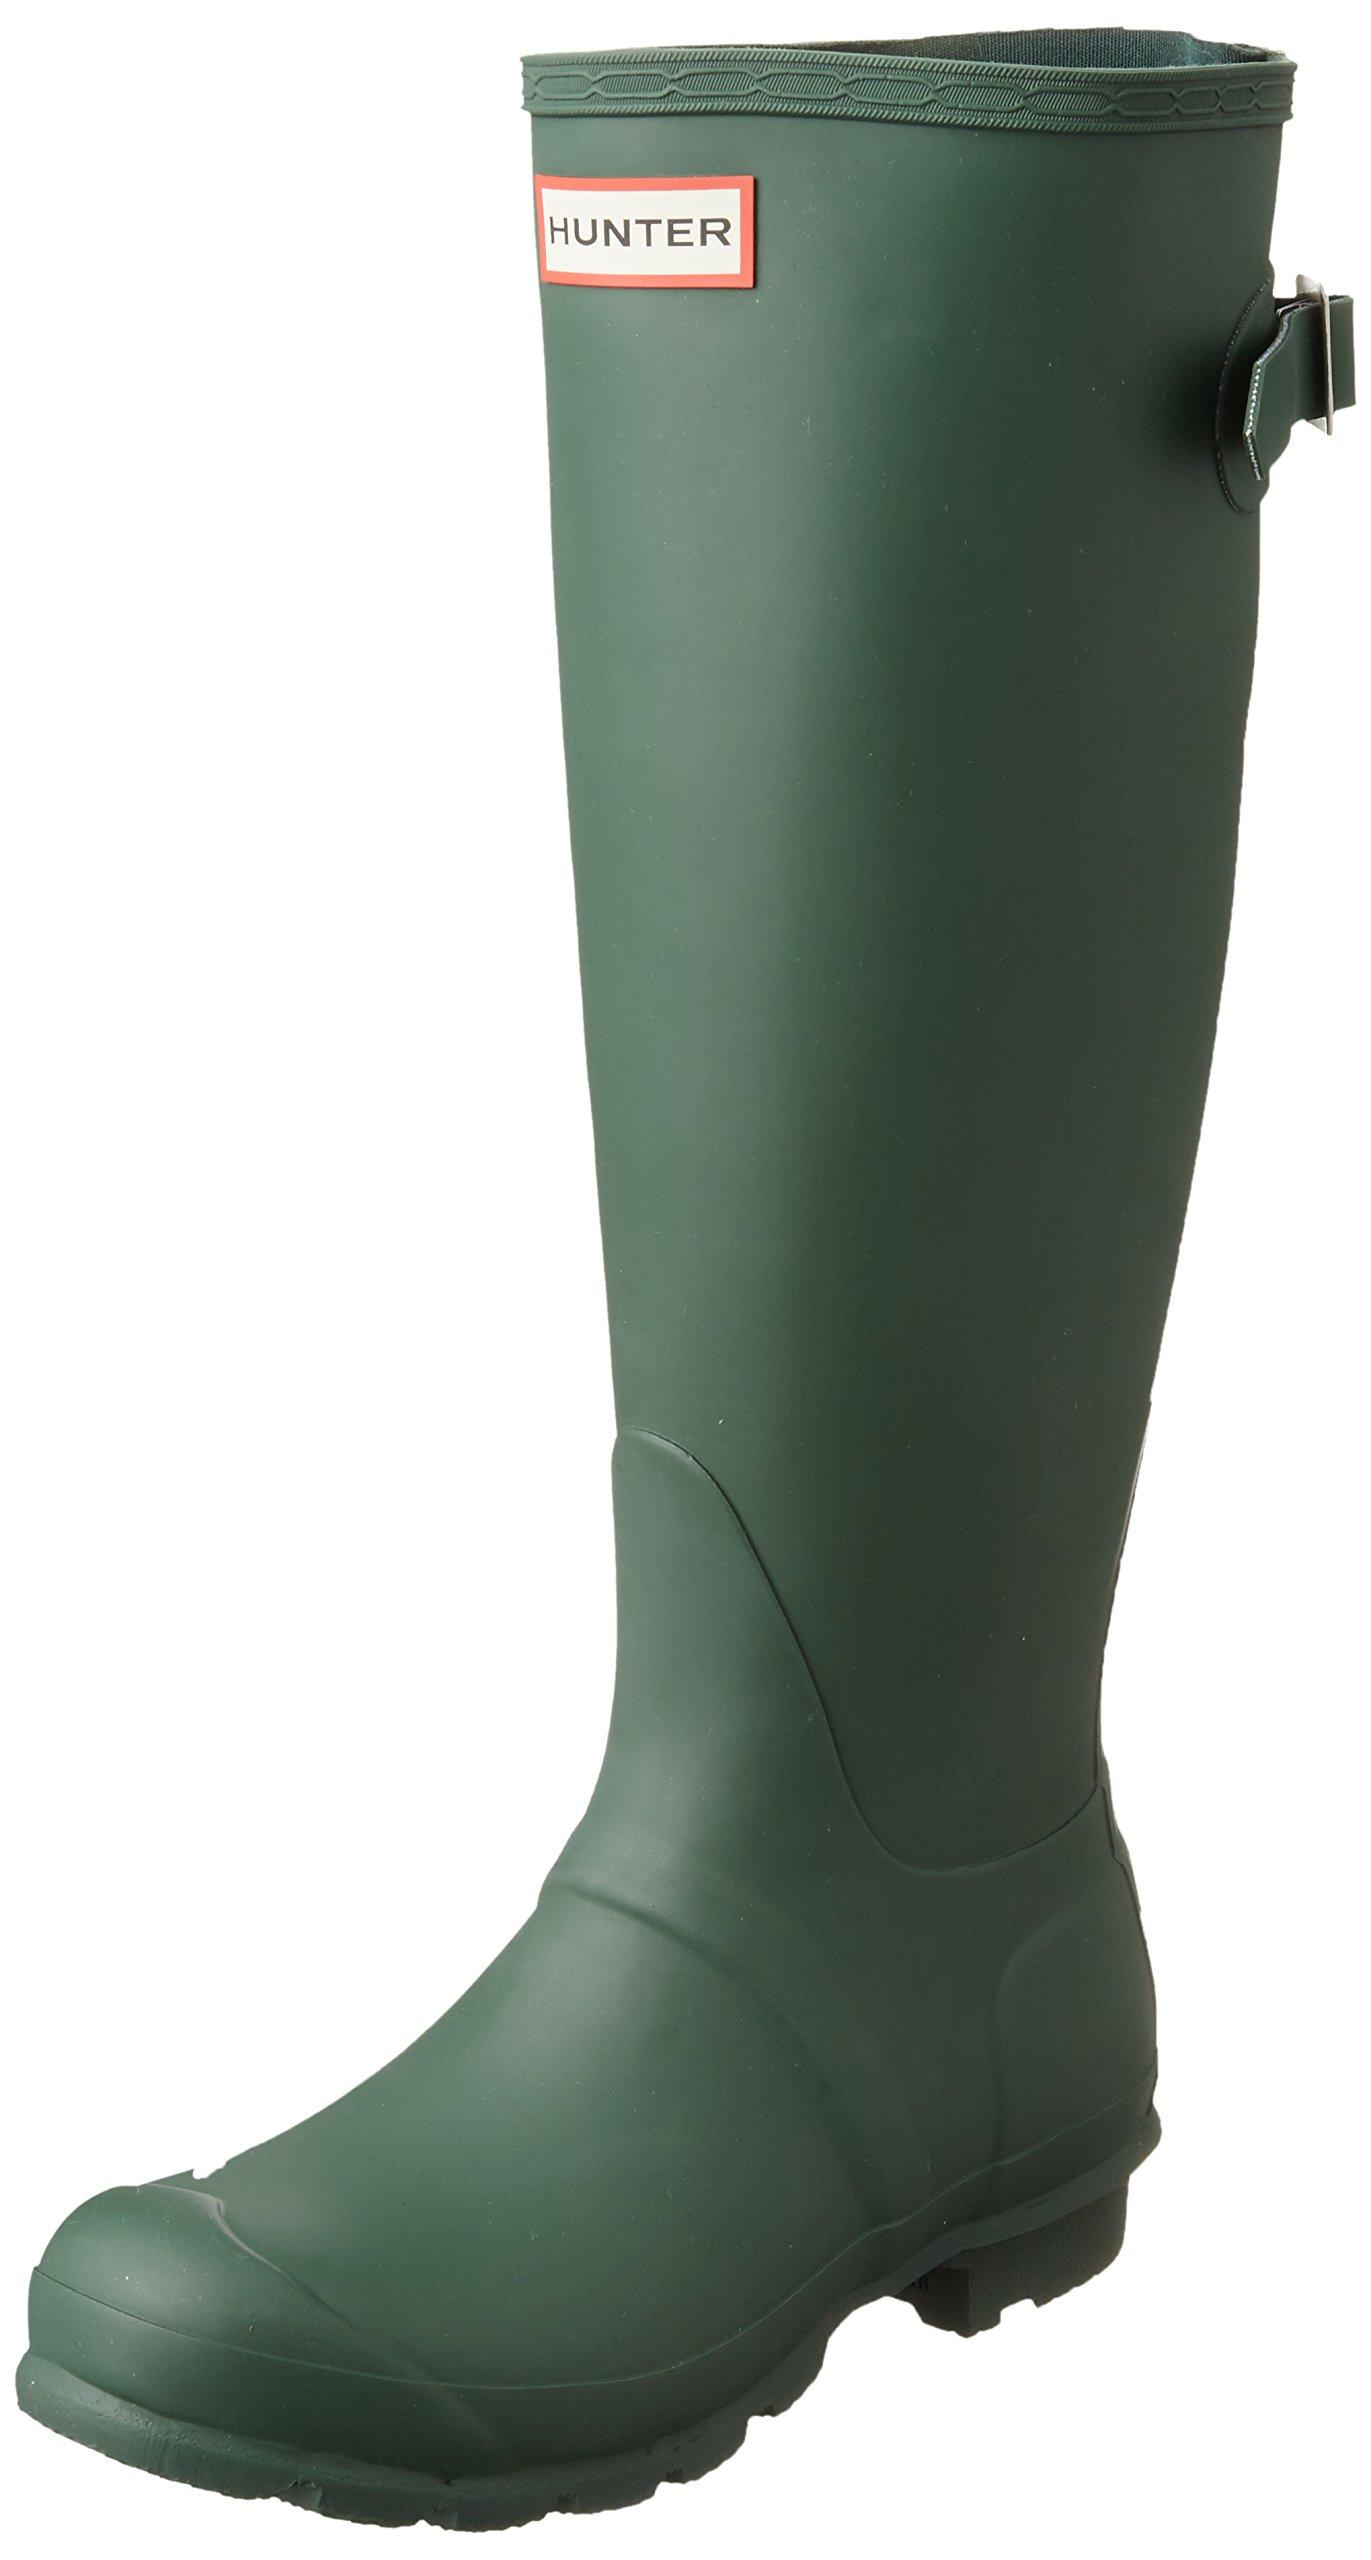 Hunter W Original Back Adjustable Tall Rain Boots Hunter Green Womens 7